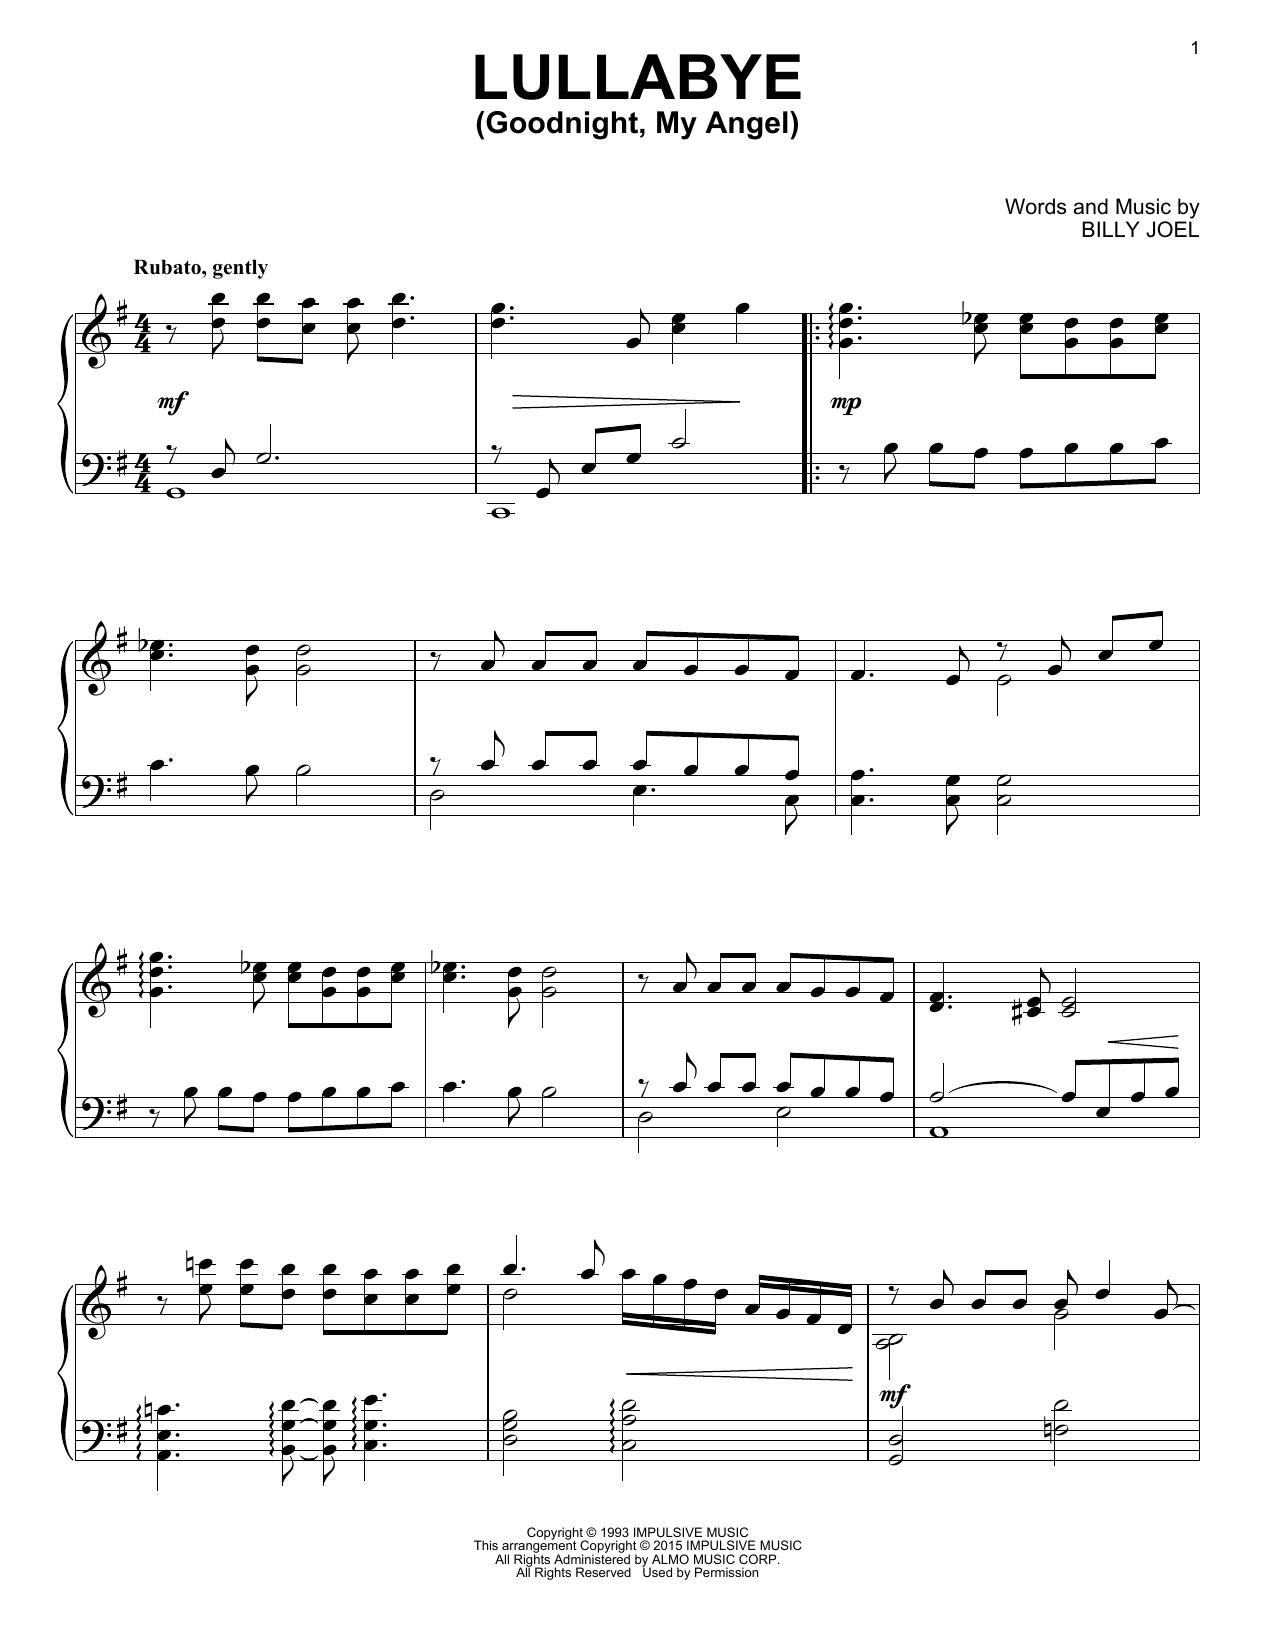 Billy Joel Lullaby Sheet Music : billy, lullaby, sheet, music, Lullabye, (Goodnight,, Angel), Billy